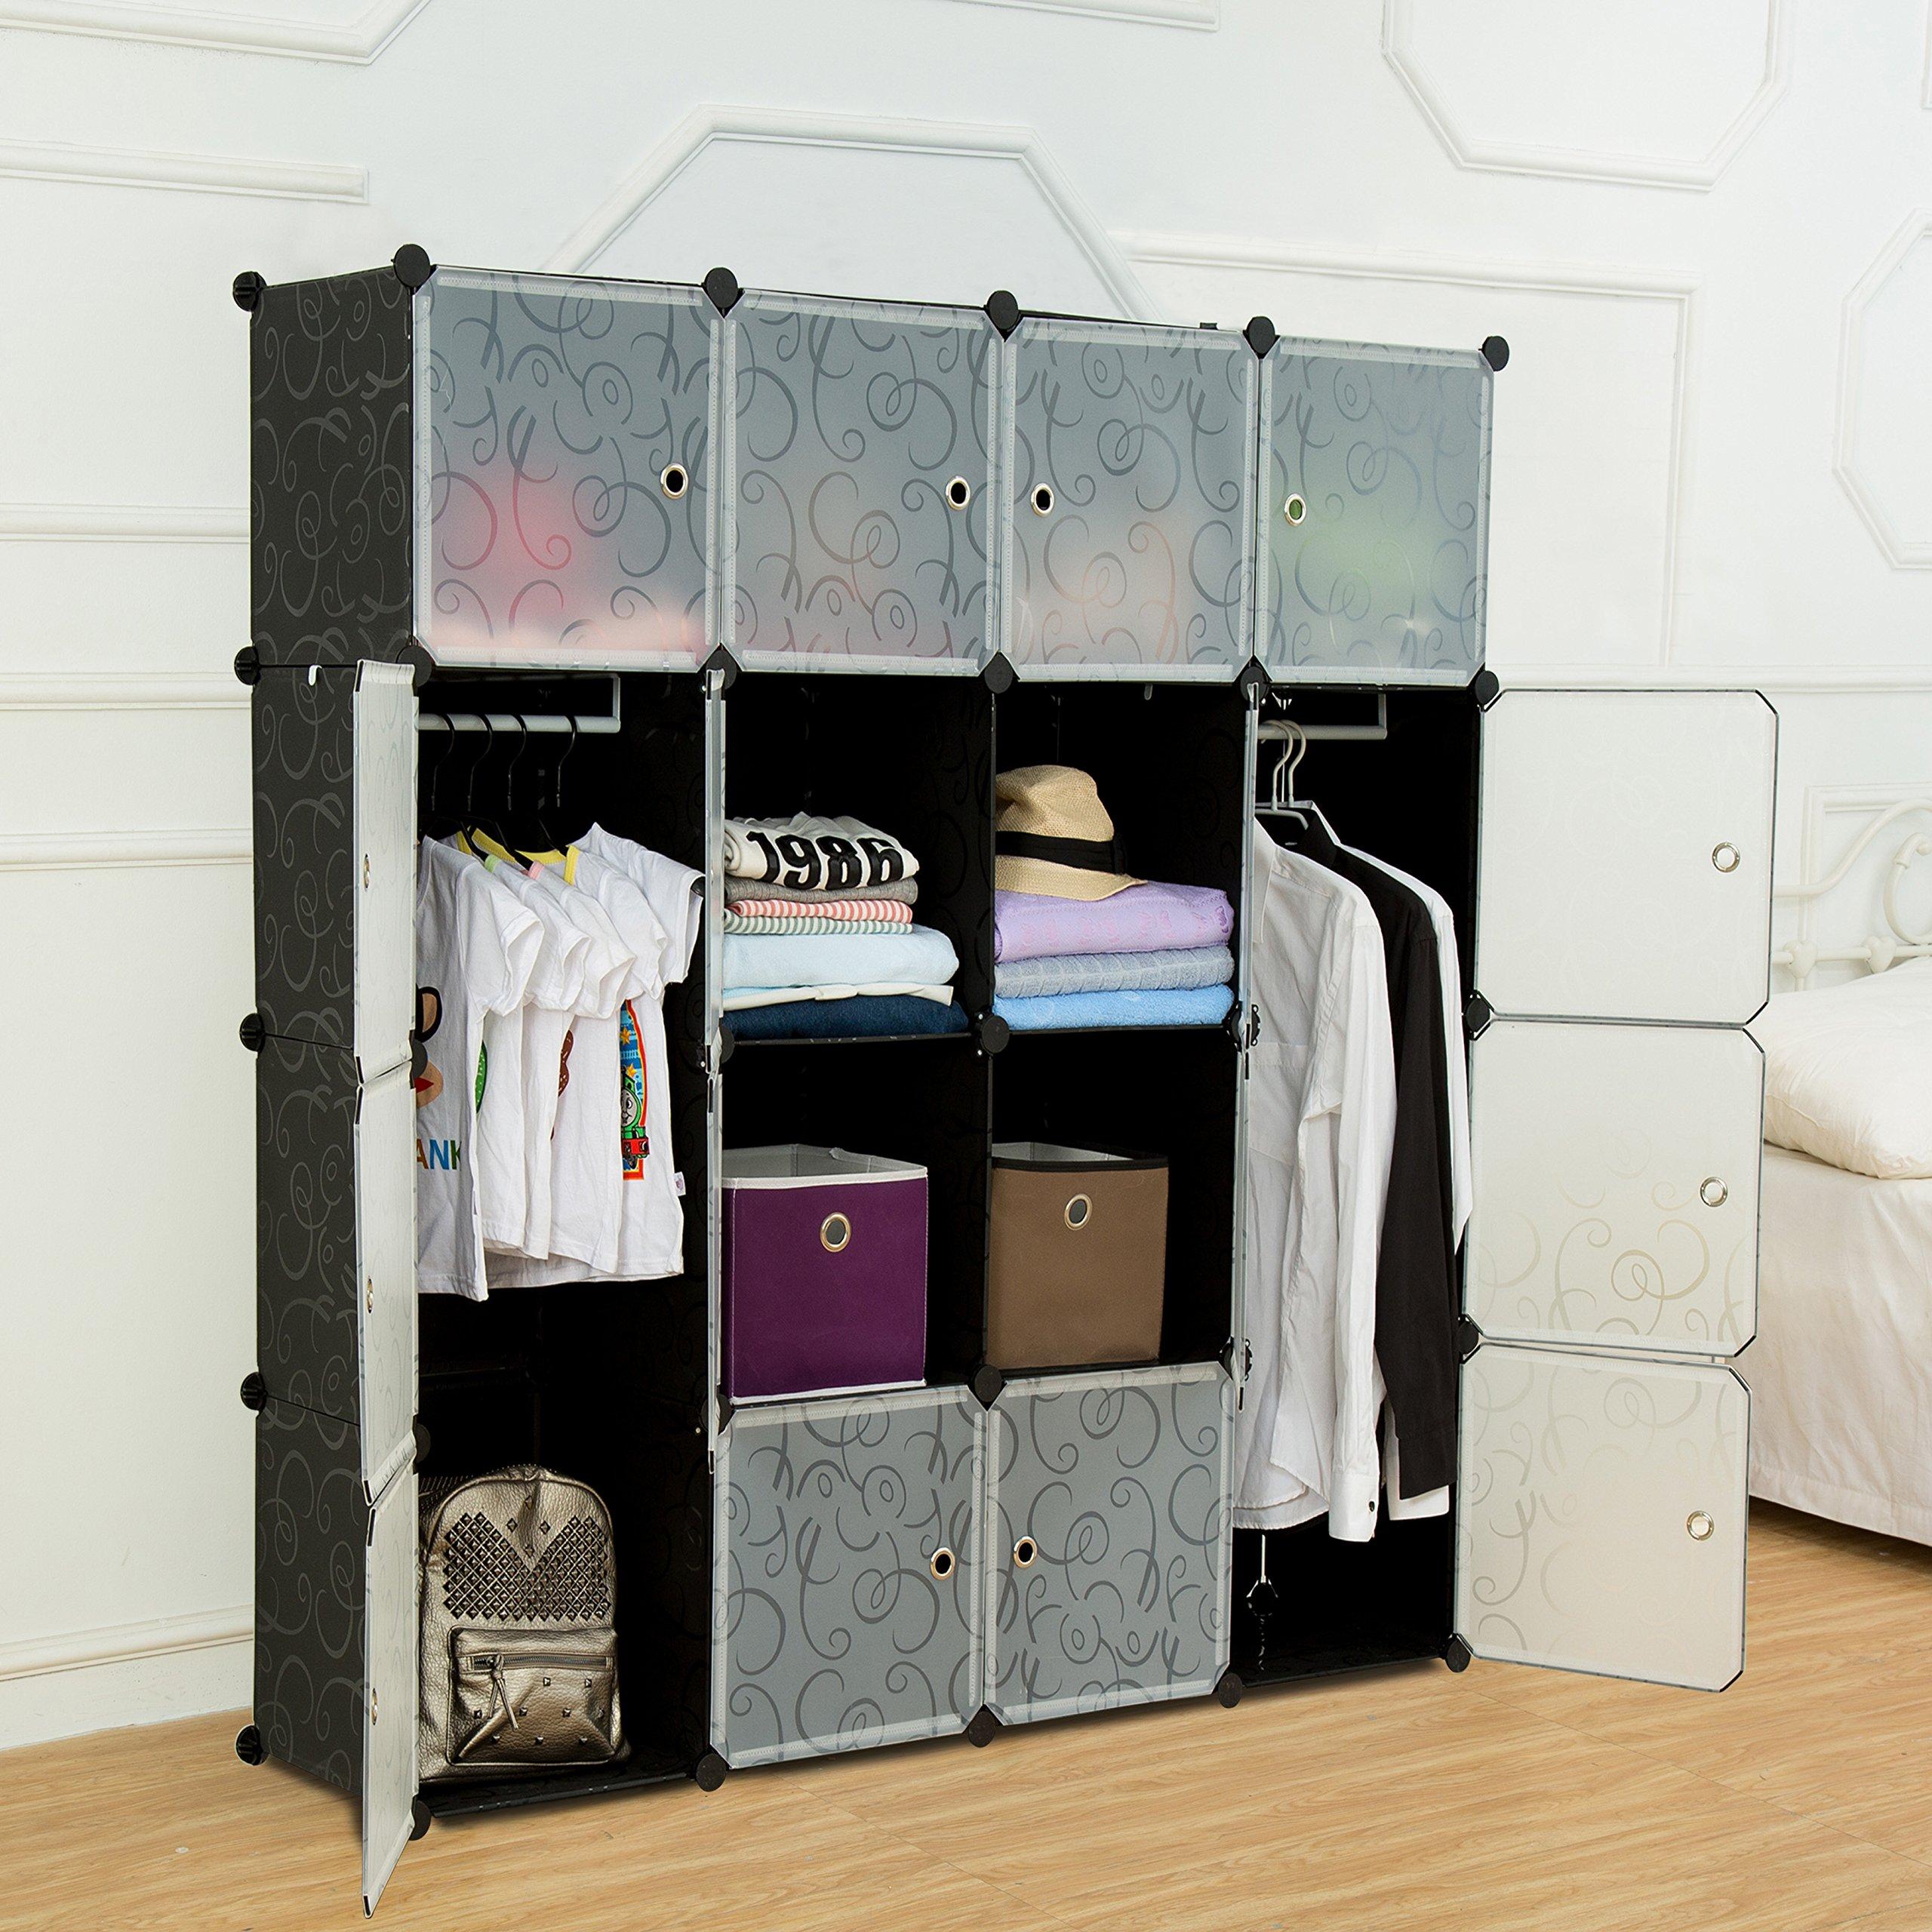 Diy cube organizer amazon unicoo multi use diy plastic 16 cube organizer bookcase storage cabinet wardrobe solutioingenieria Images